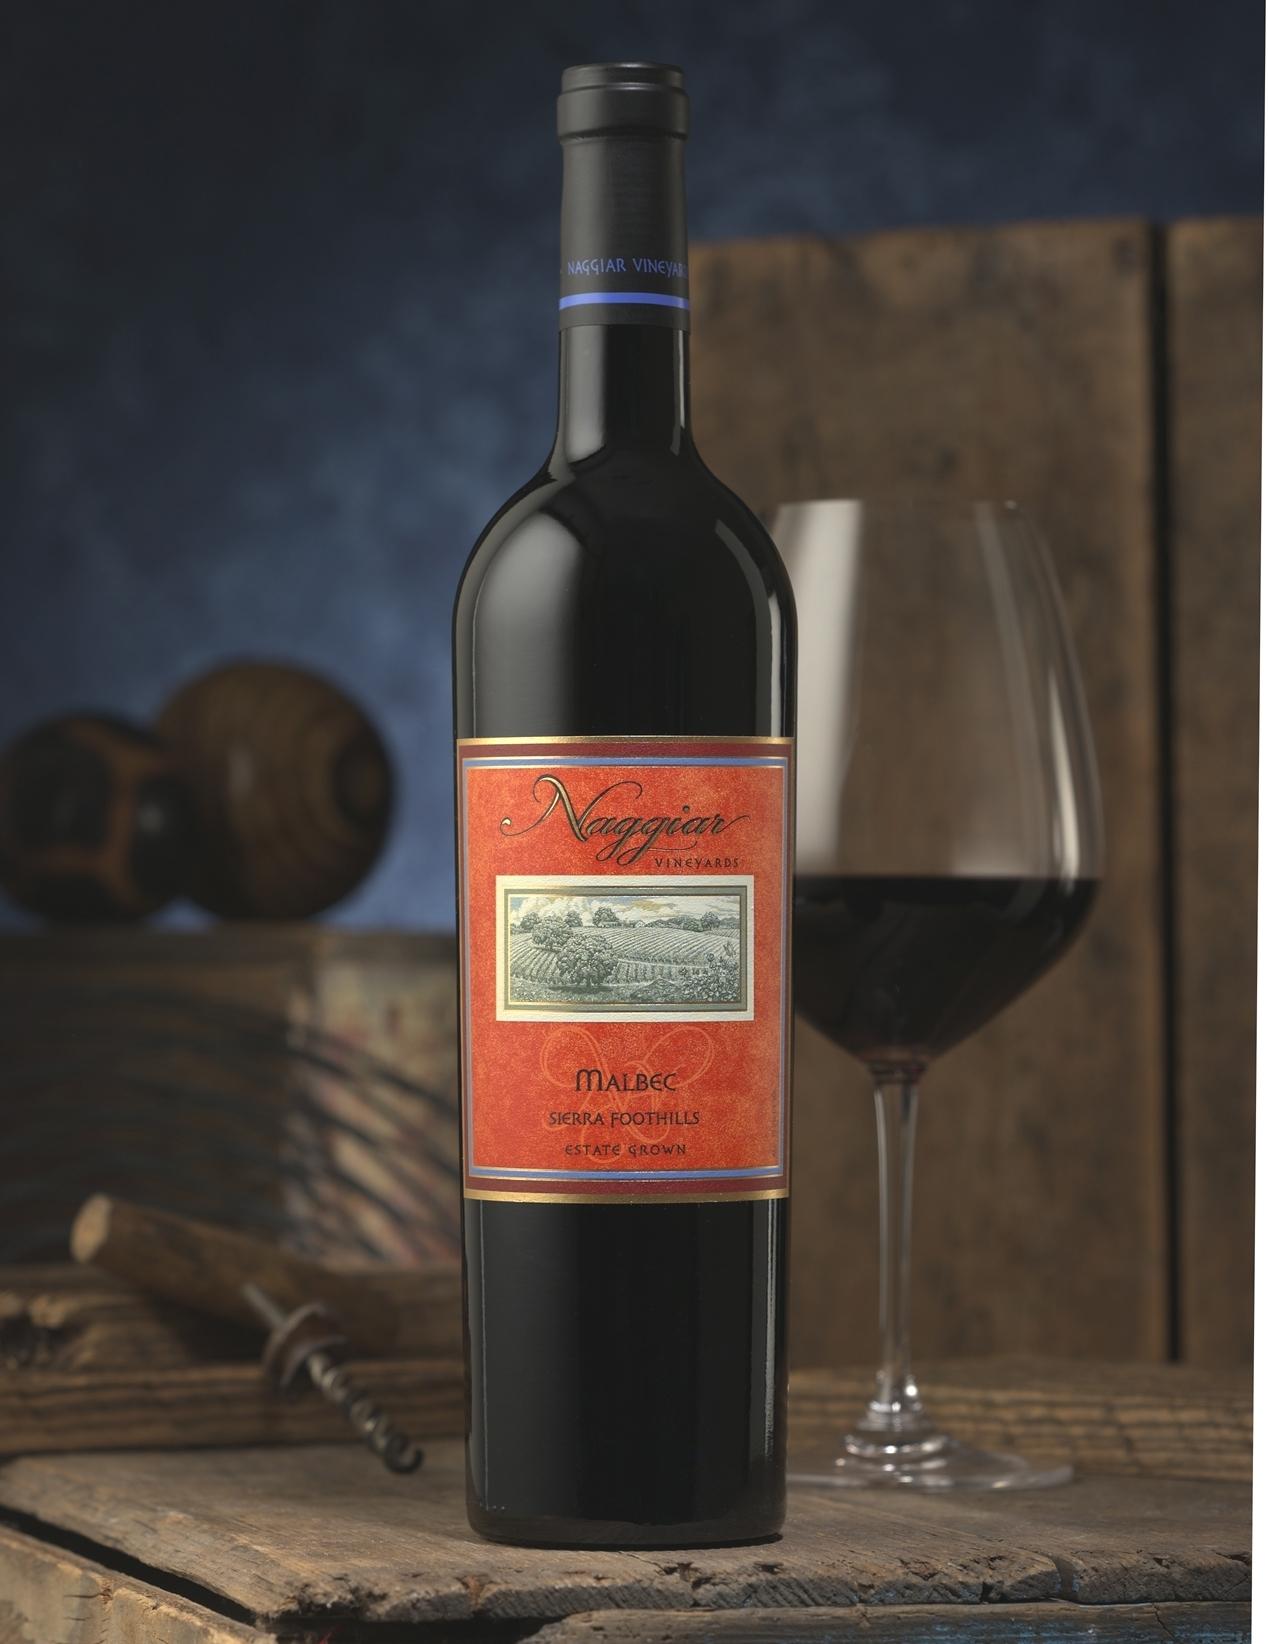 2016 Malbec Naggiar Vineyards